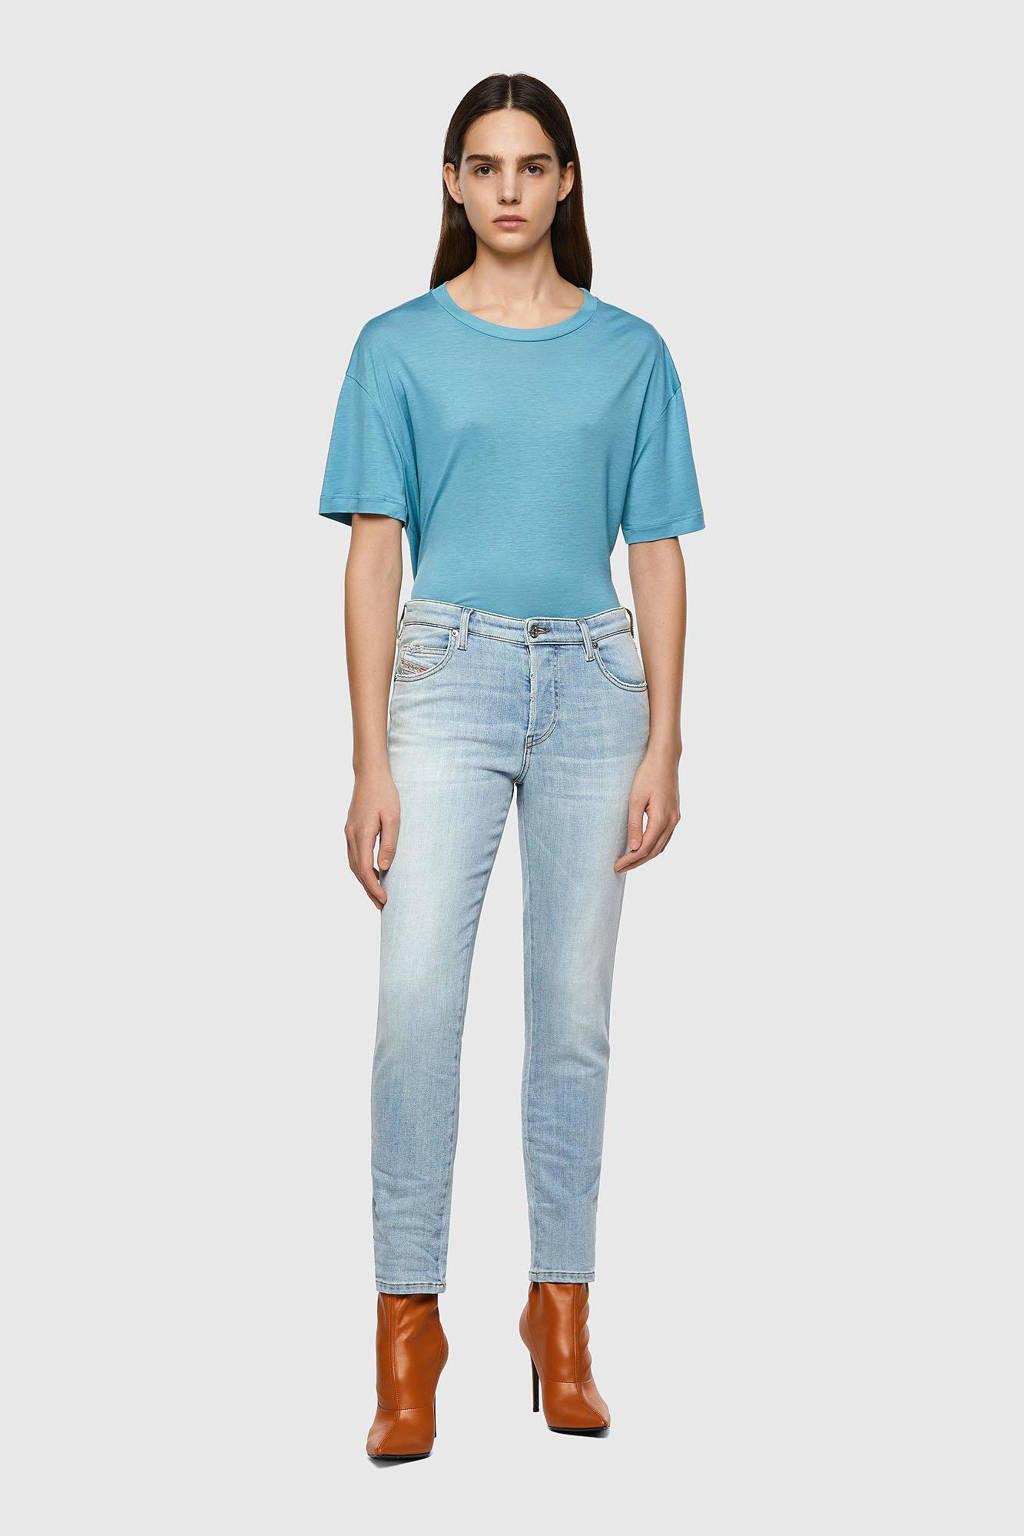 Diesel slim fit jeans BABHILA light blue, Light Blue